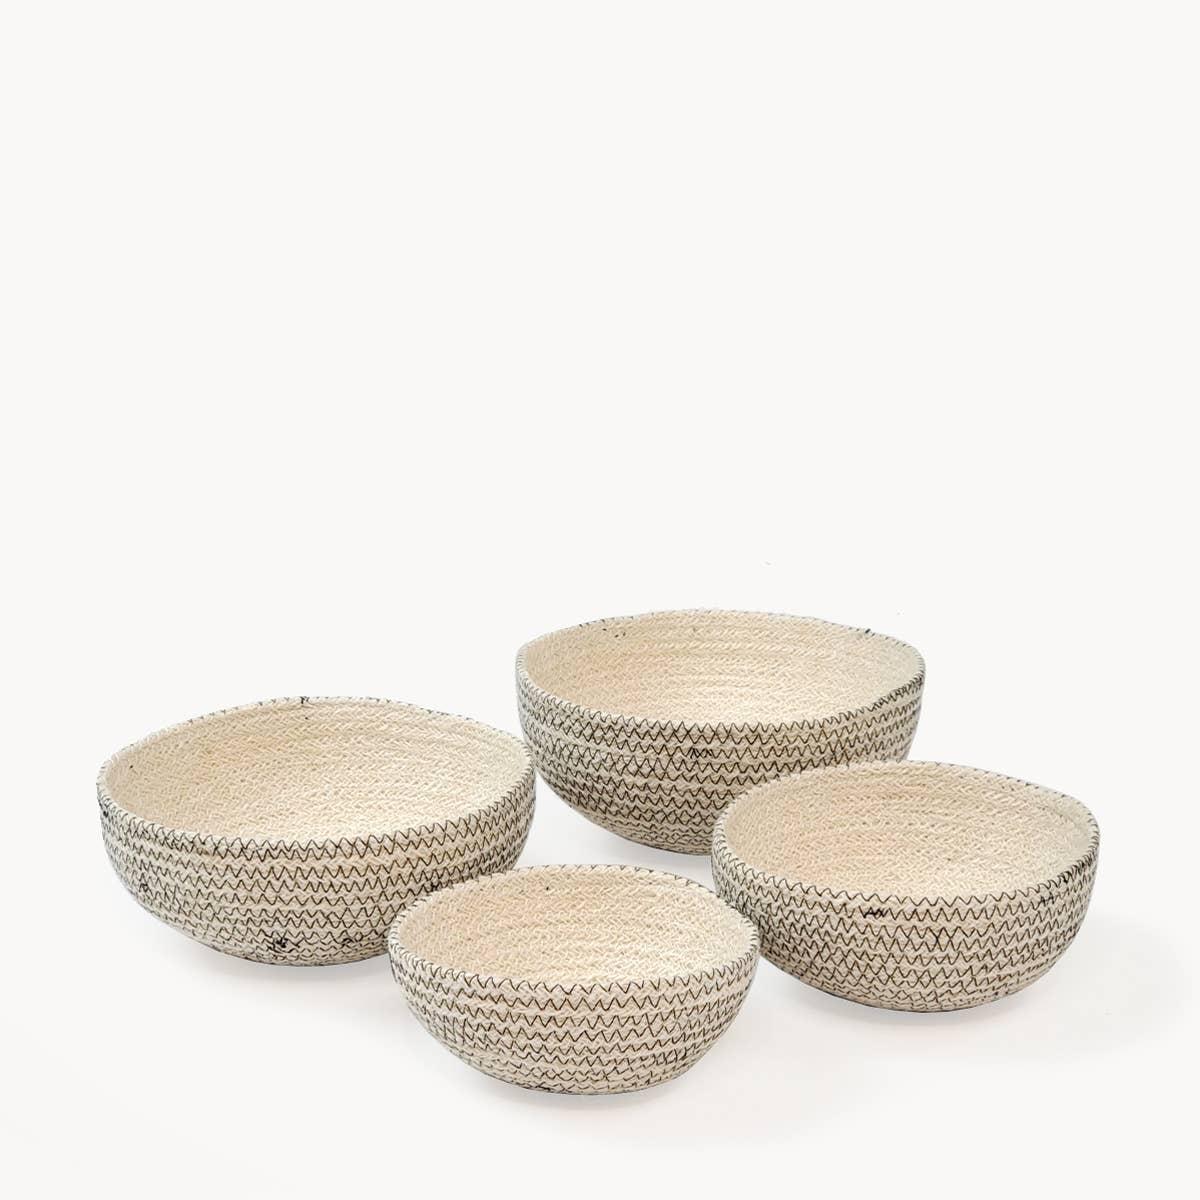 Amari Round Bowl - Black (Set of 4) | Trada Marketplace